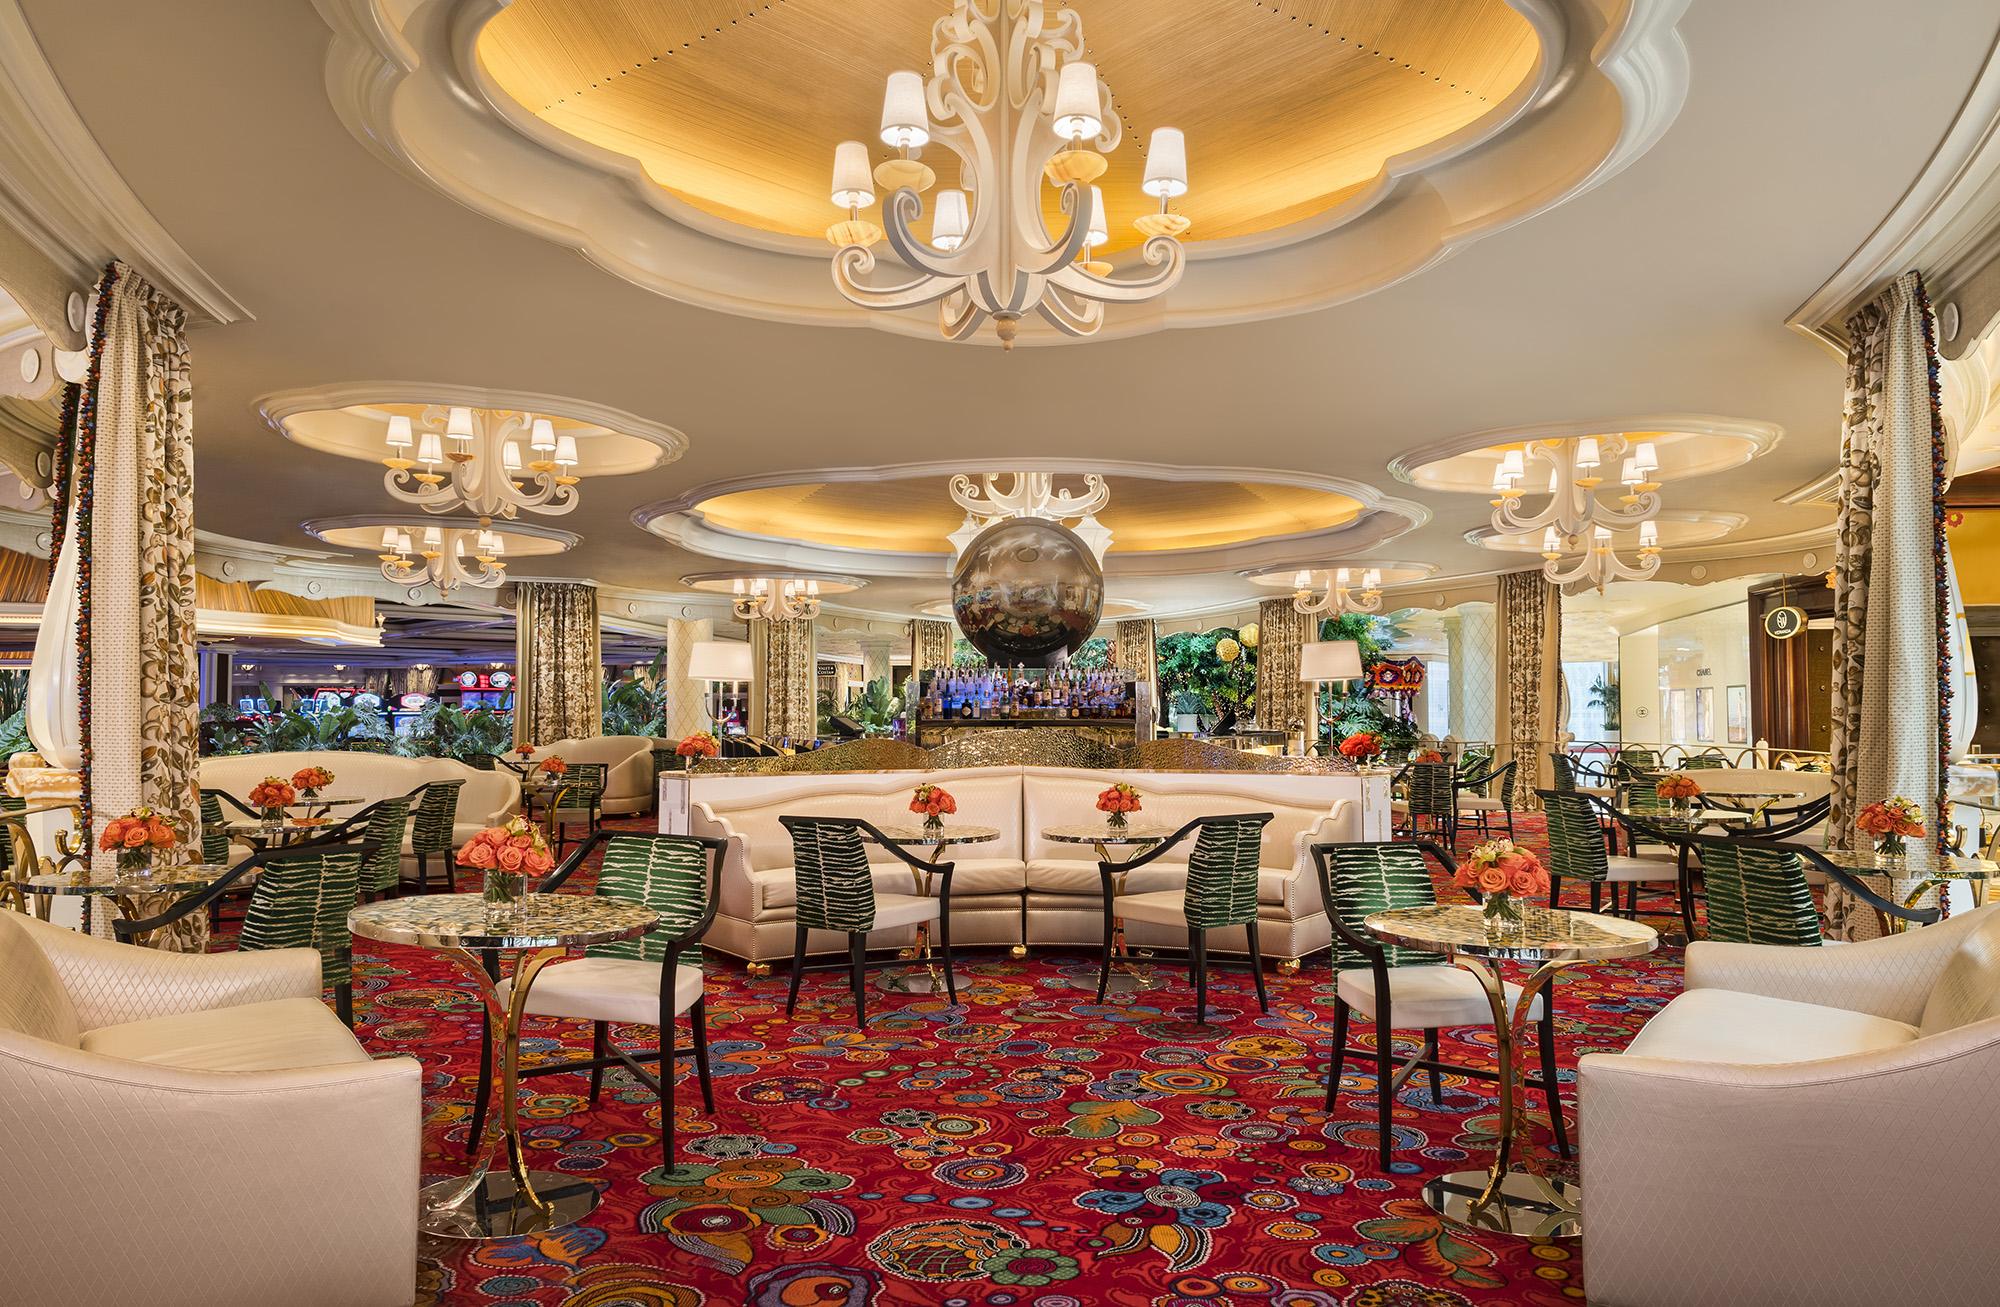 ... Photography / Hotel Photography / Hotel Resort Photography /  Hotel/resort Photographer / Interior Design Photography Las Vegas / Interior  Photography ...